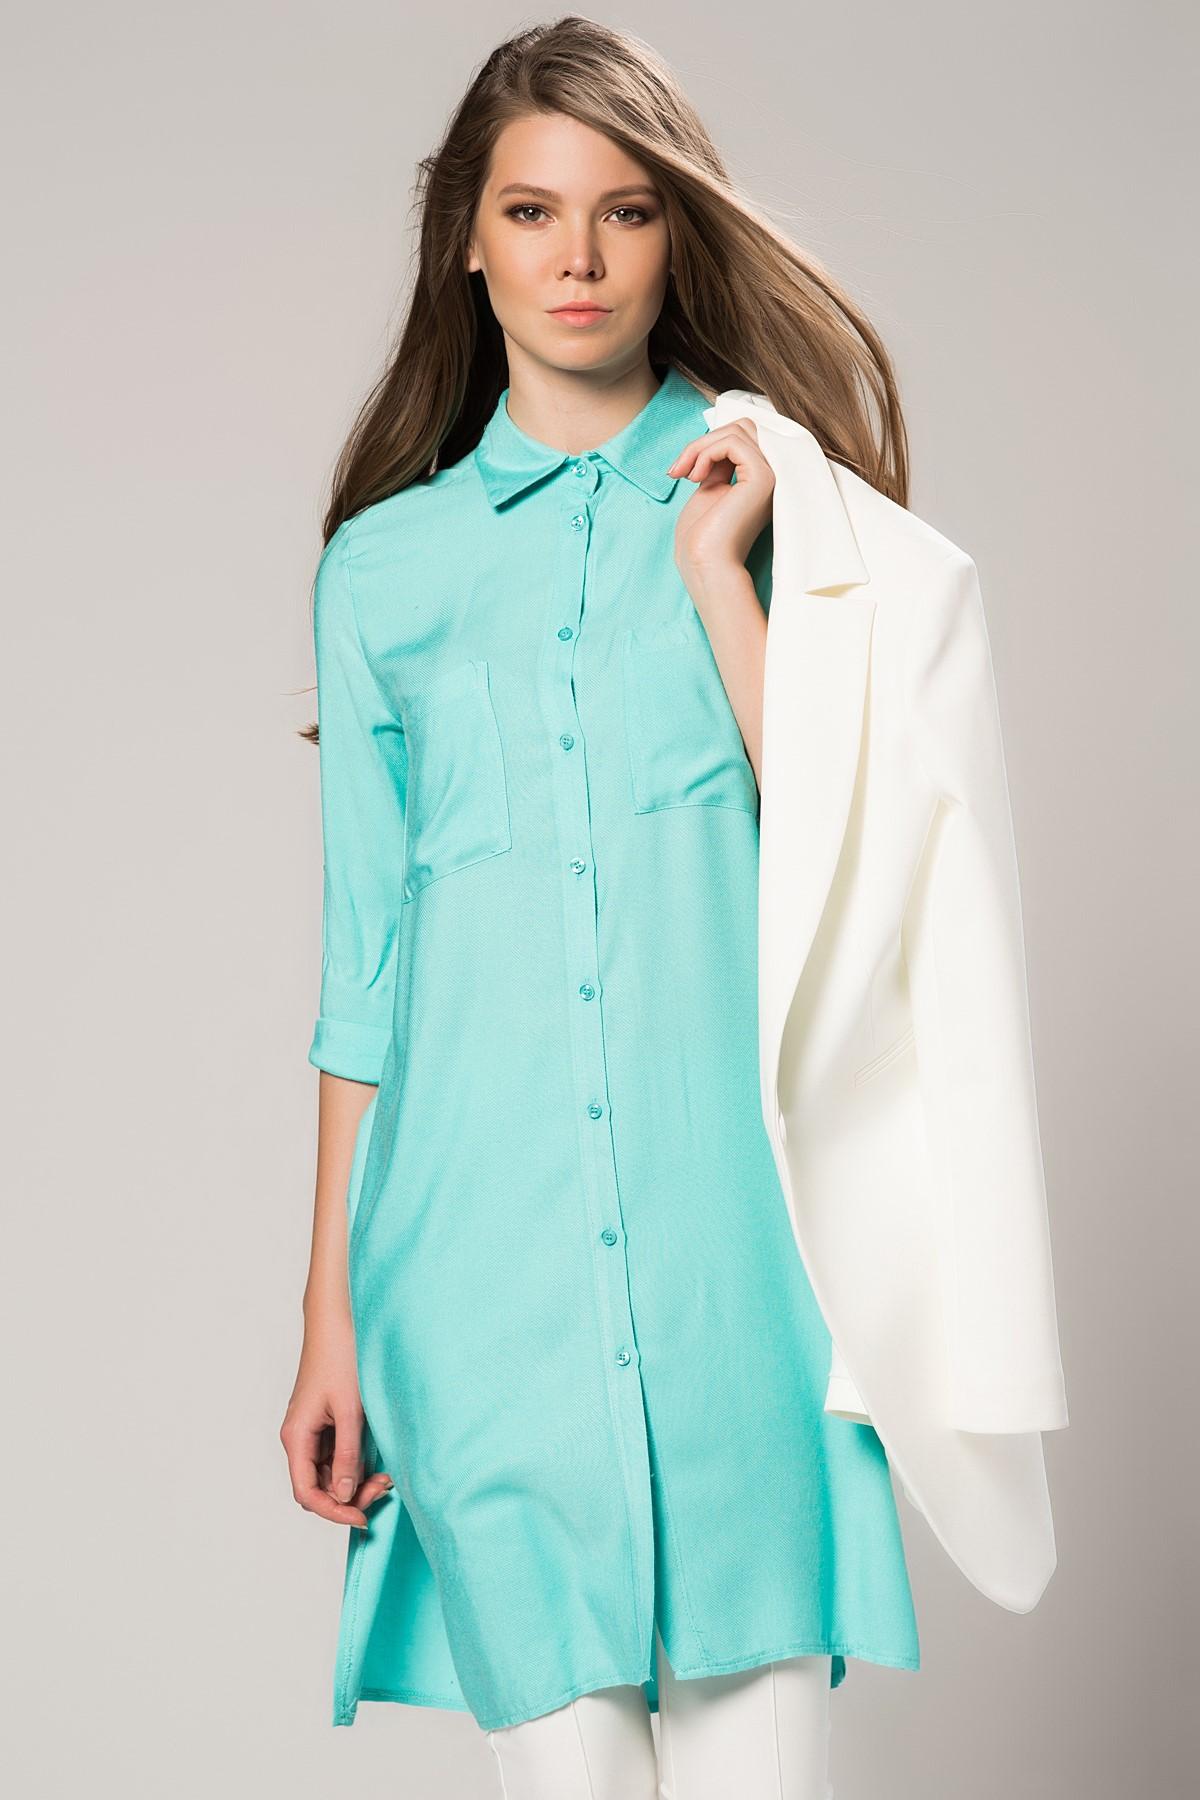 Mint Yeşili Vavist Tunik Modeli